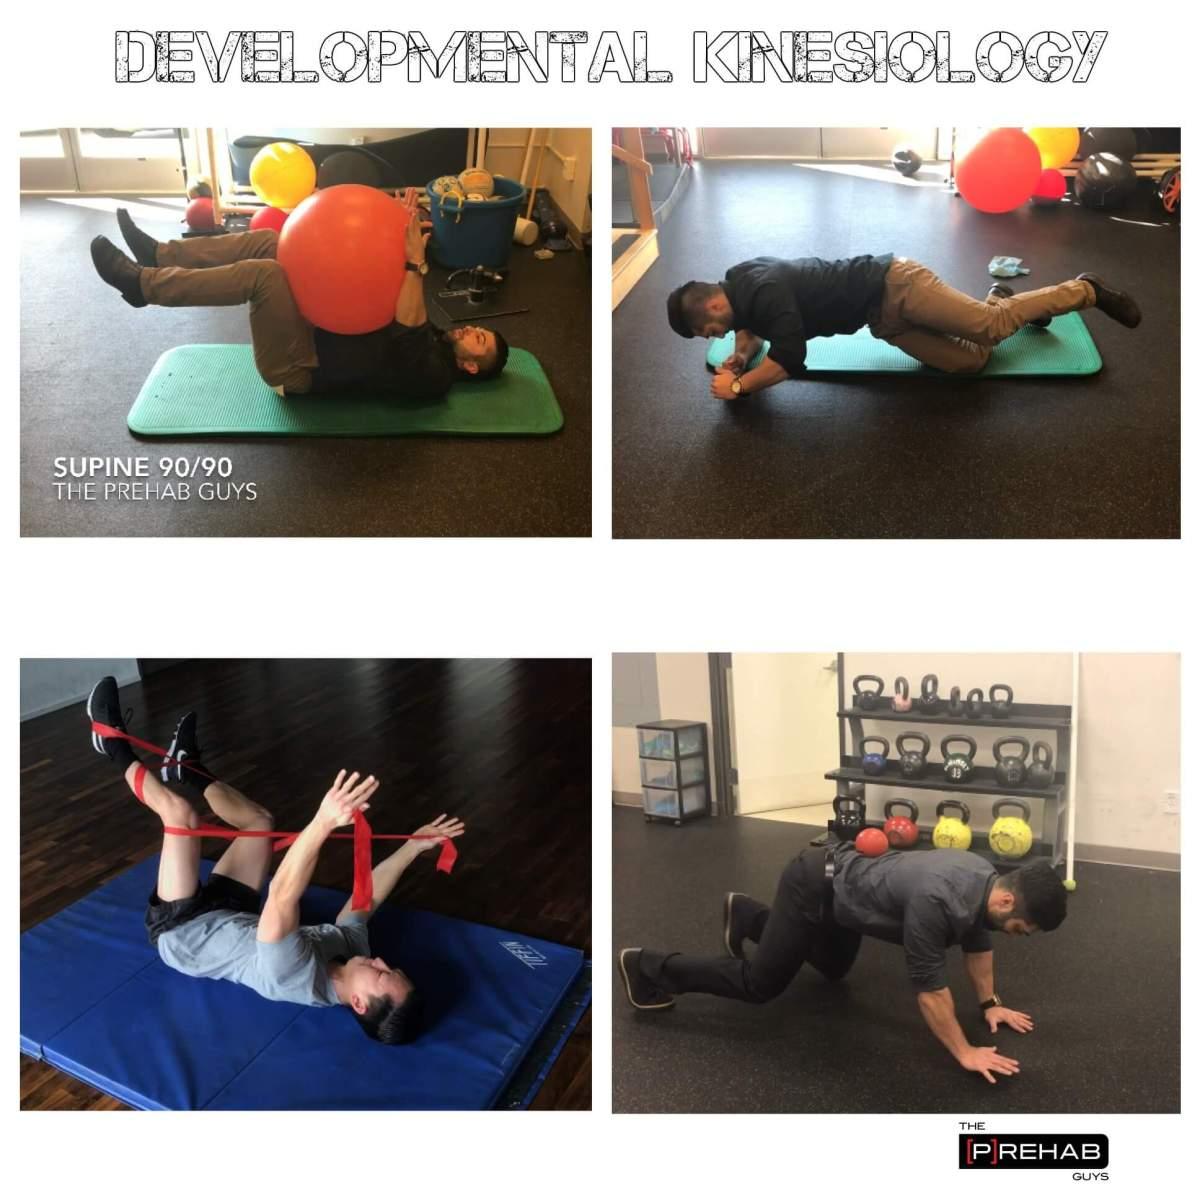 Developmental Kinesiology